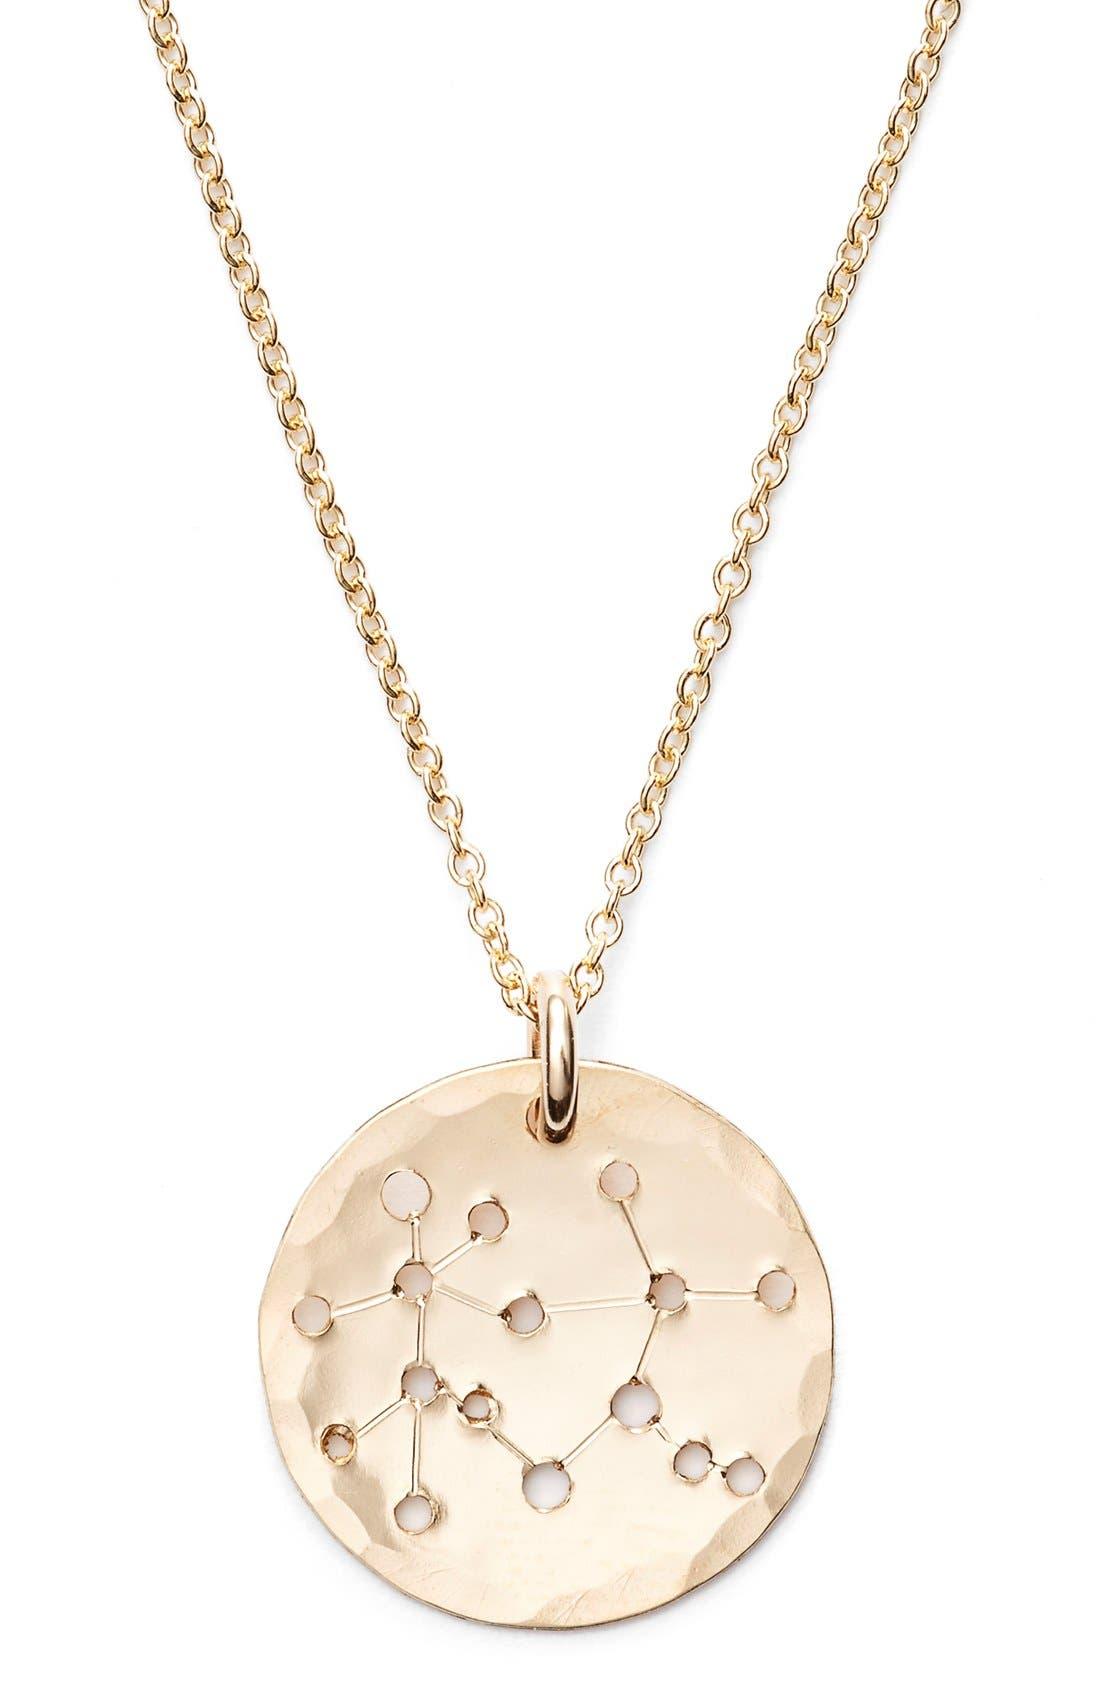 Ija 'Small Zodiac' 14k-Gold Fill Necklace,                             Alternate thumbnail 15, color,